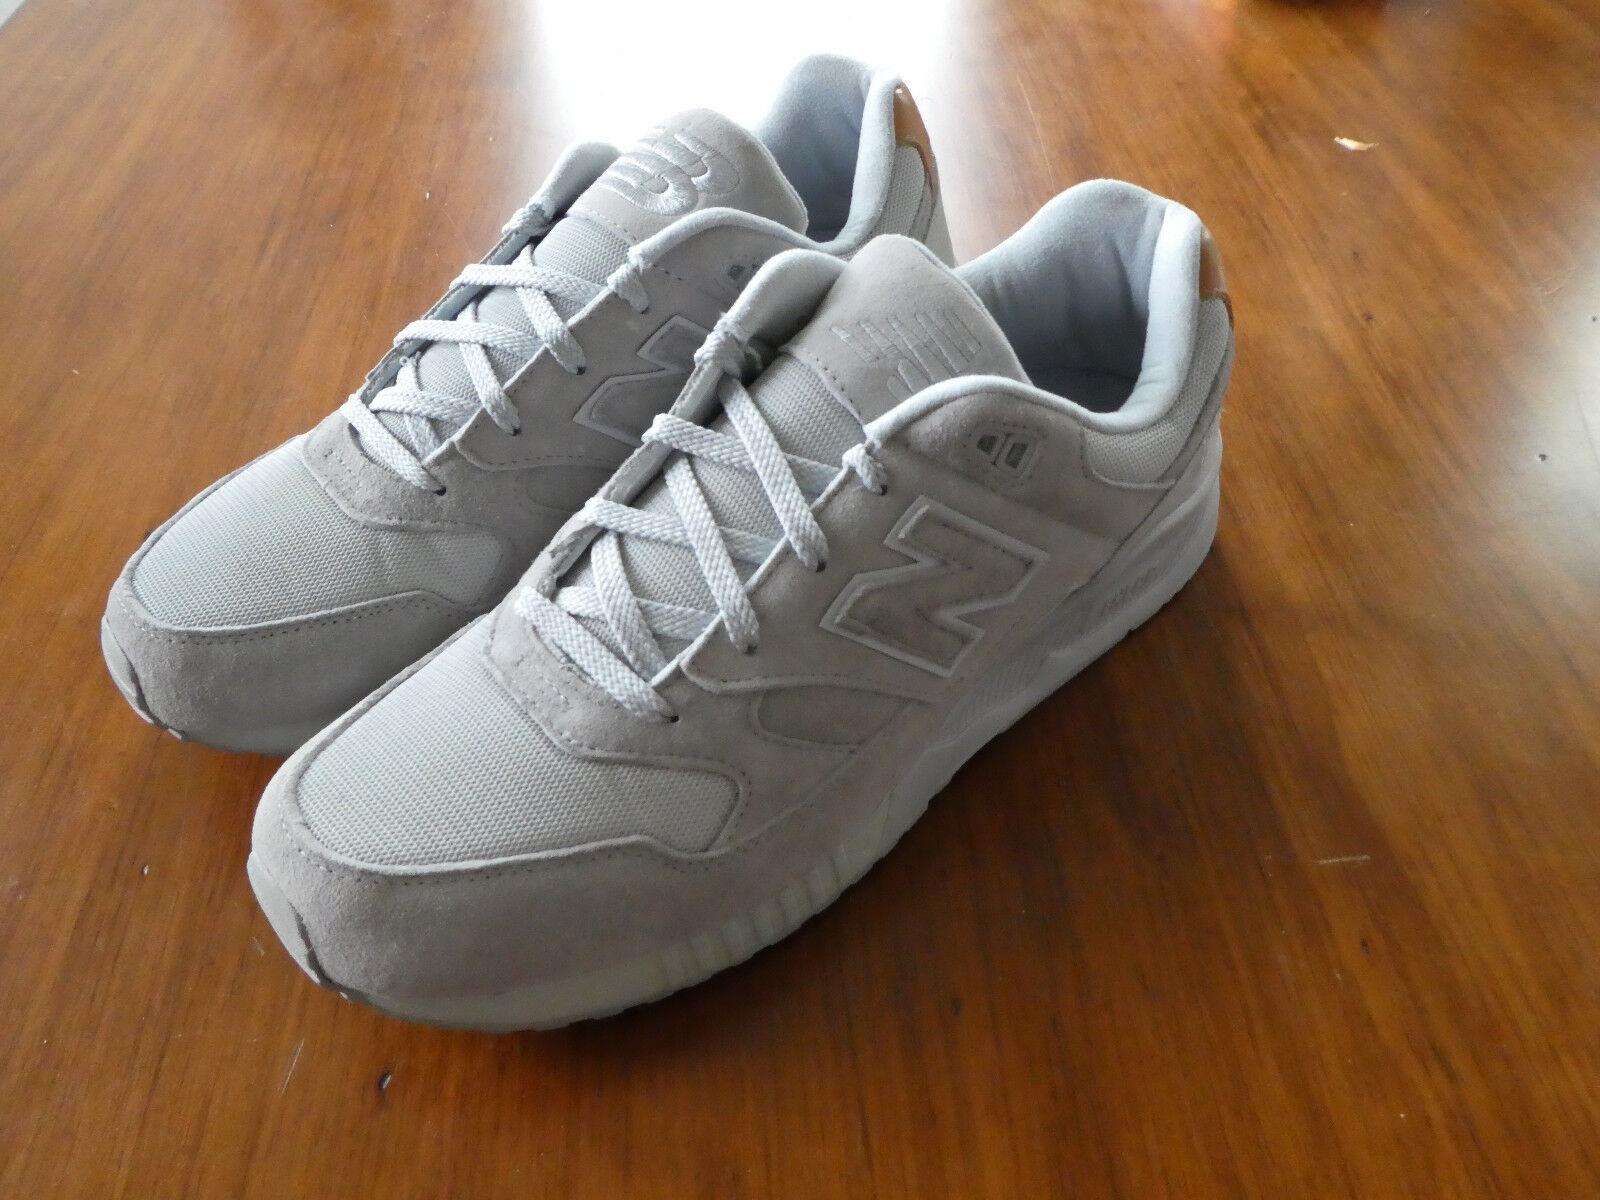 Mens New Balance 530 Shoes M530MOG Sneakers size 12 gray monotone